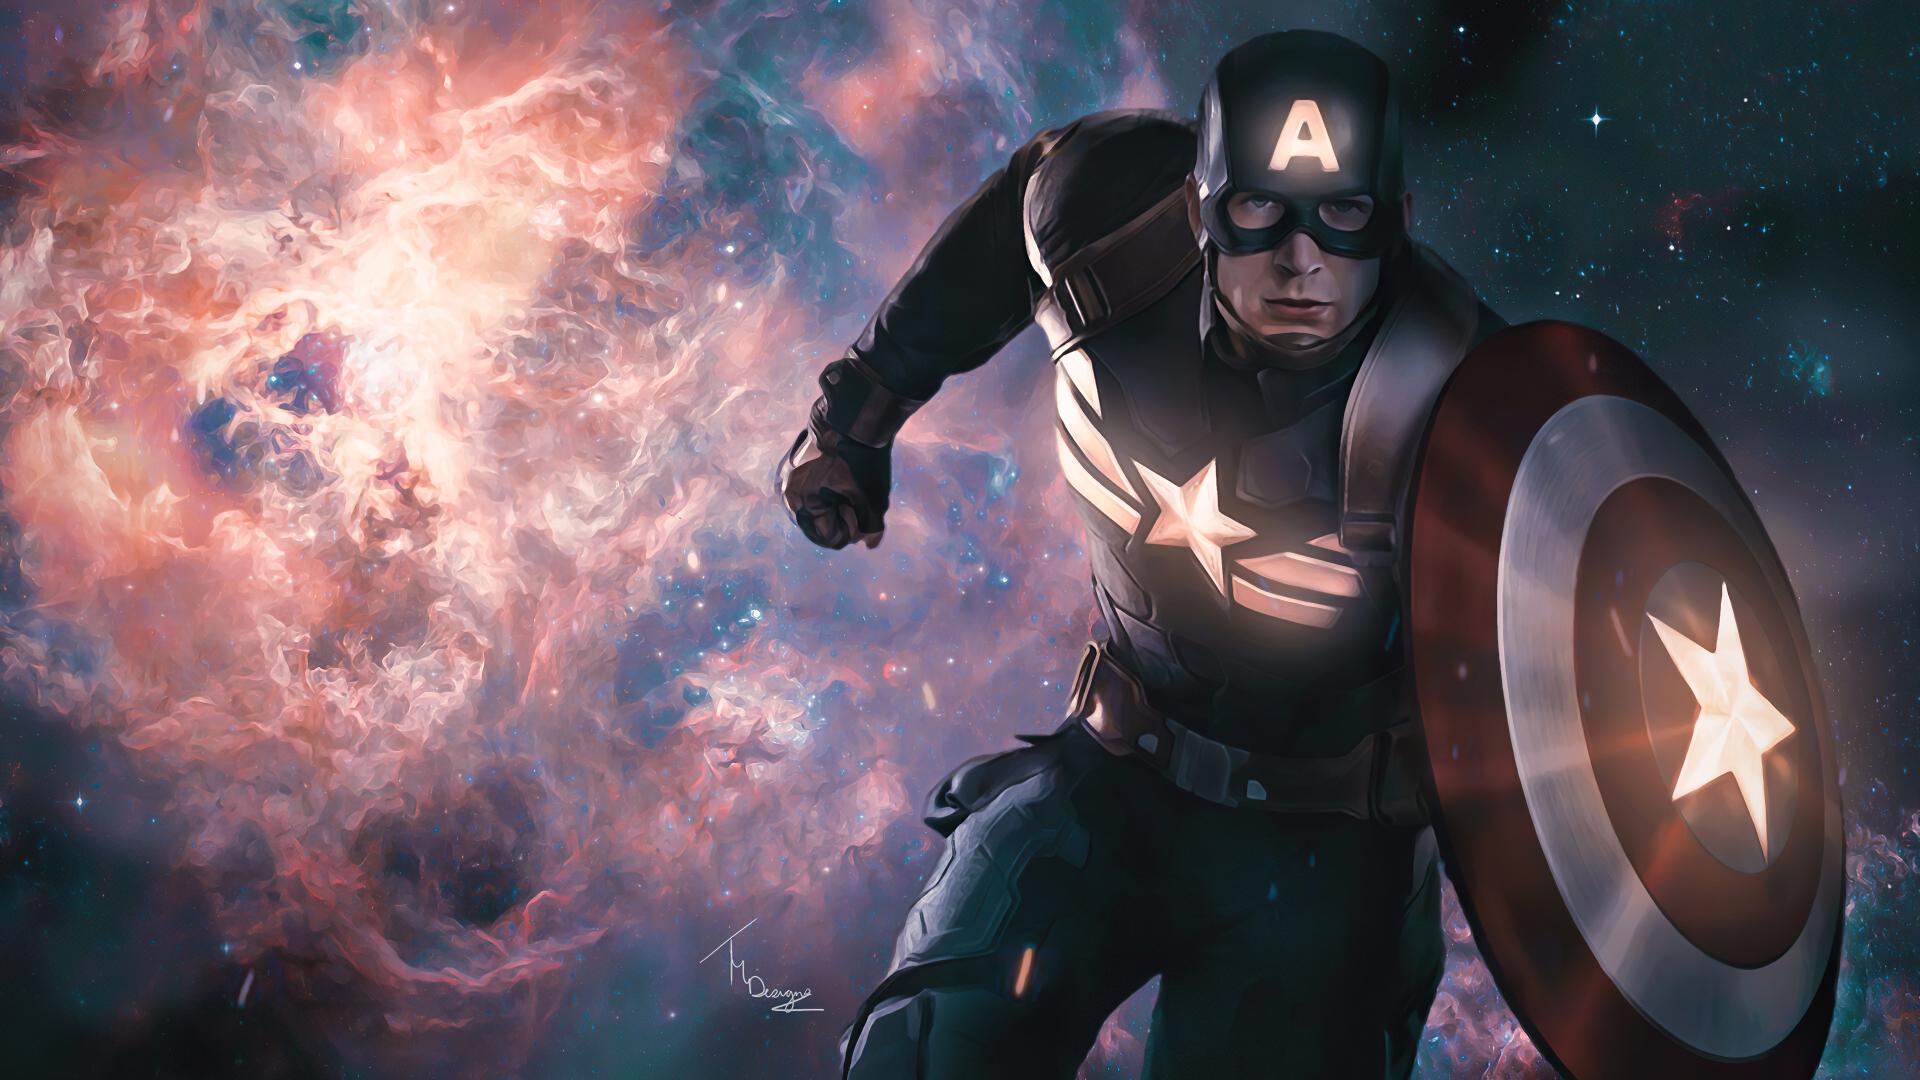 1920x1080 Poster of Captain America 1080P Laptop Full HD ...